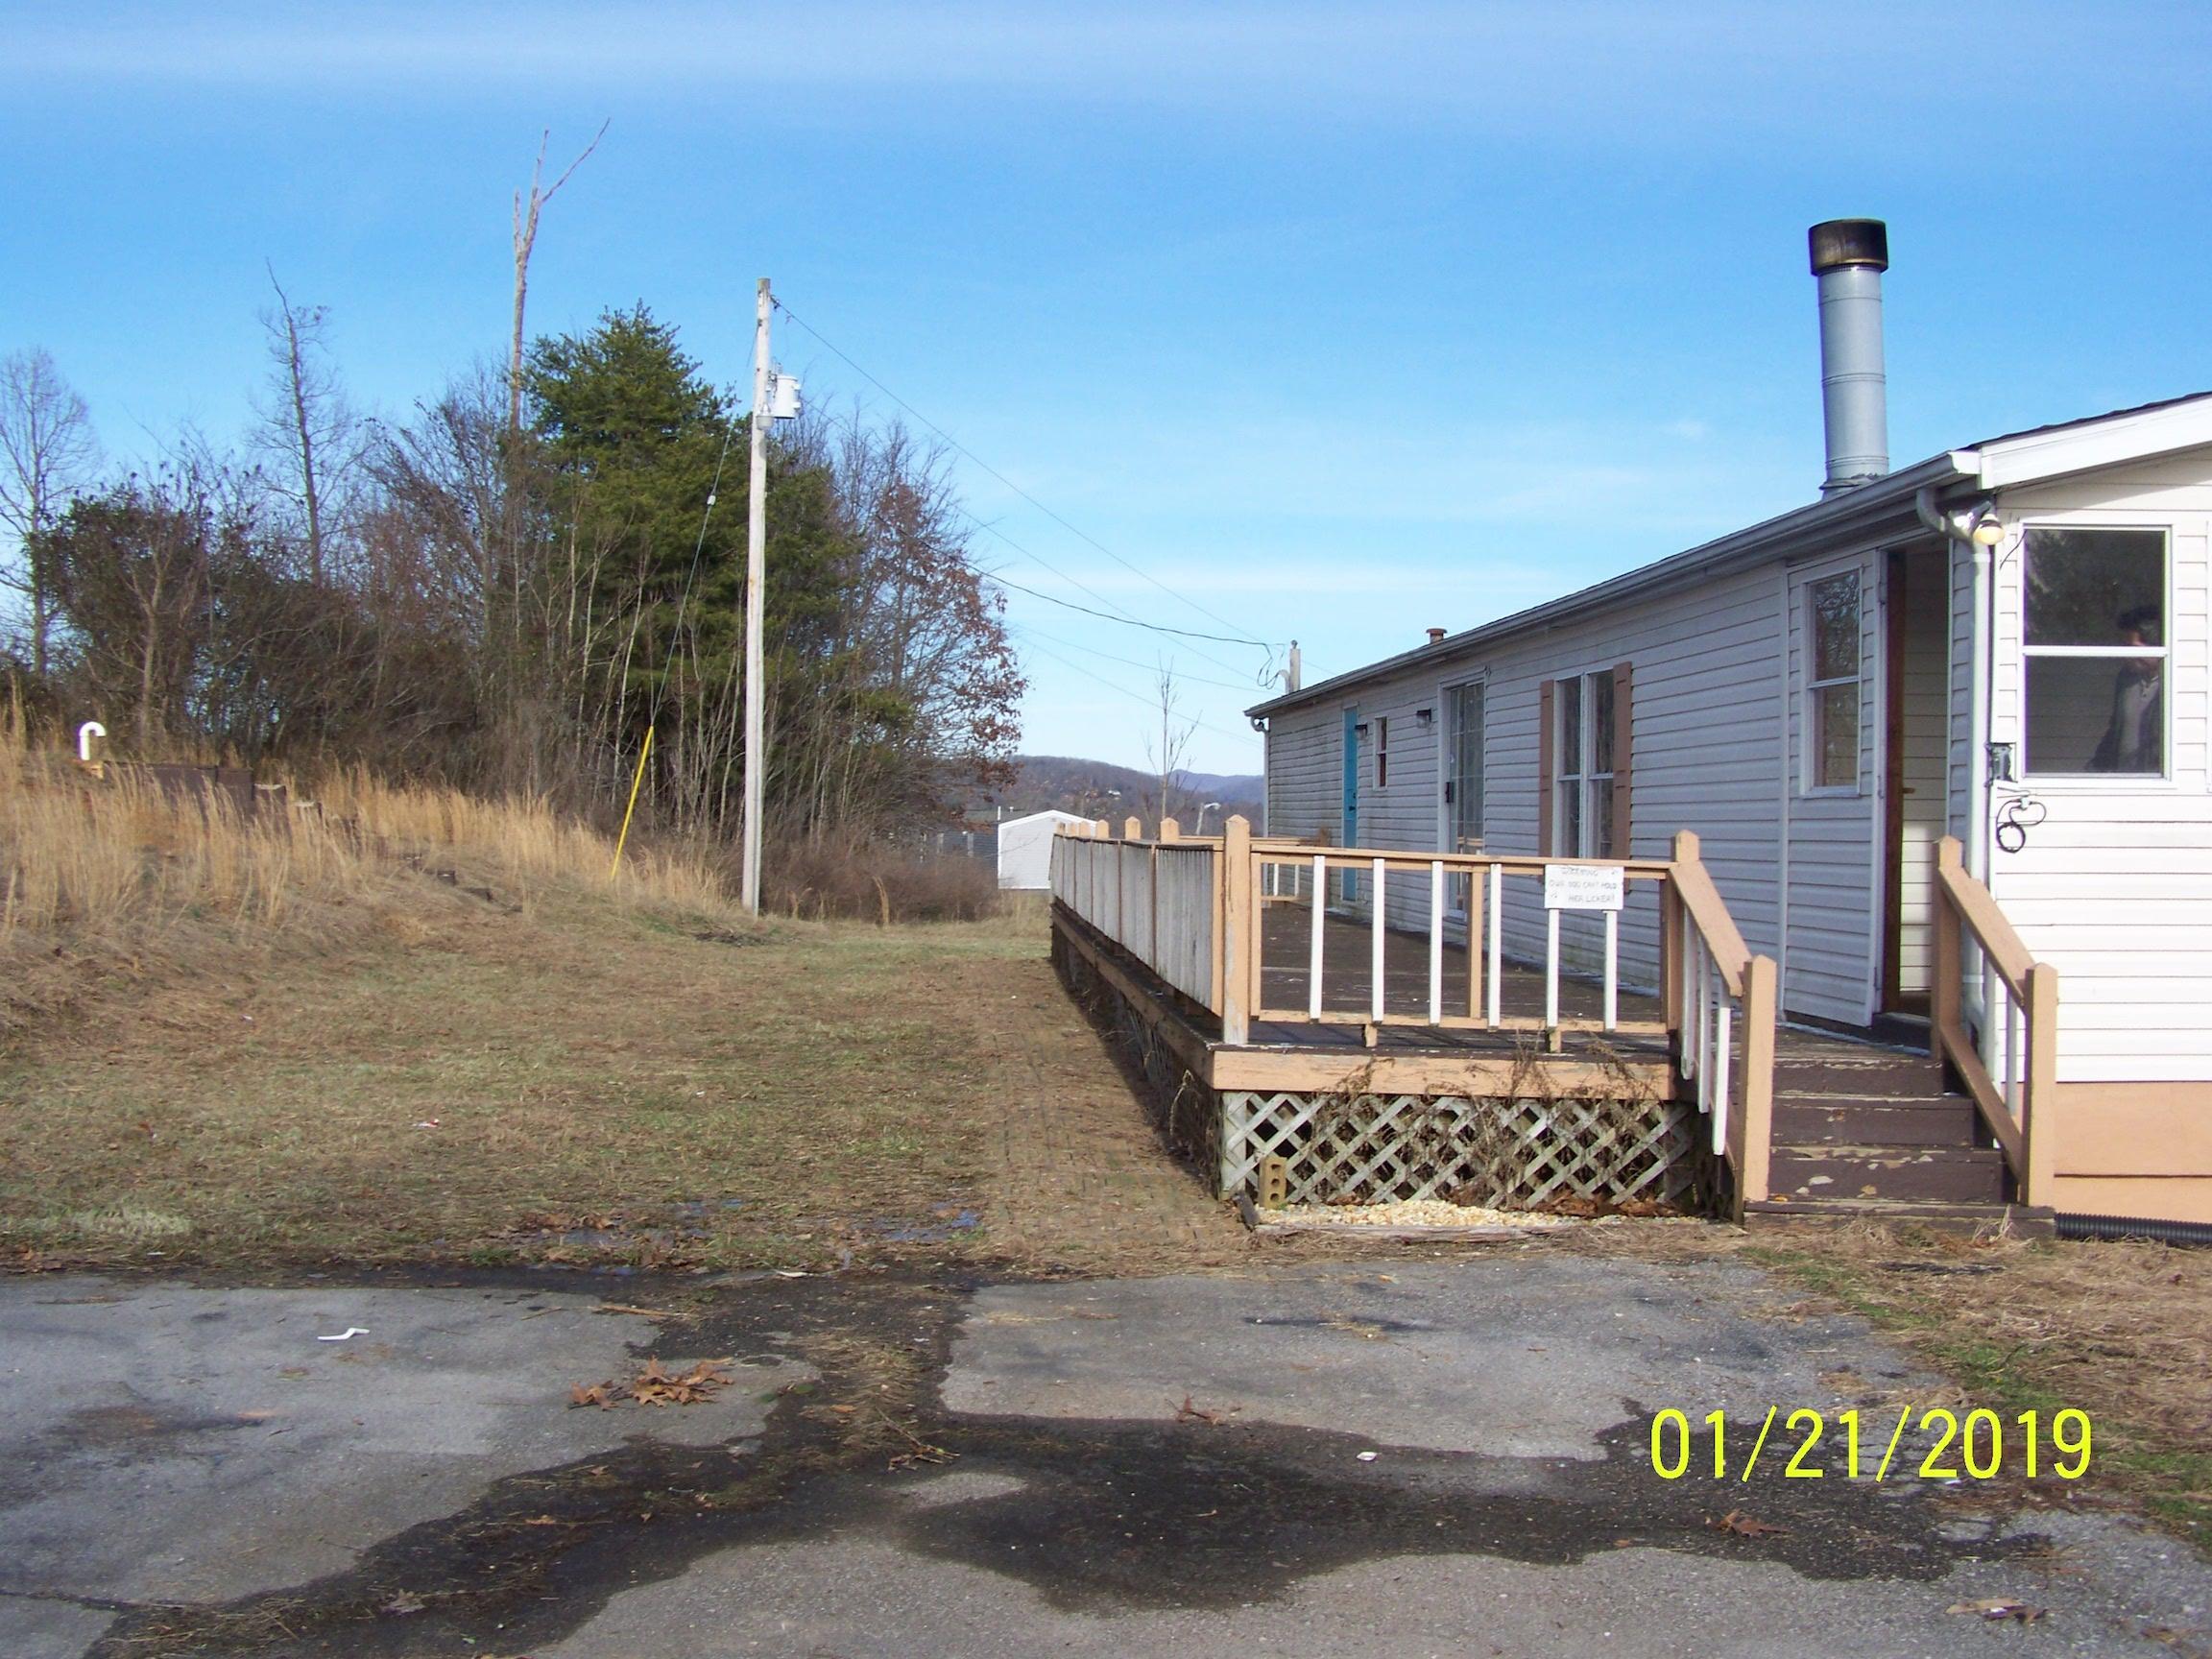 9115 Hwy111, Byrdstown, Tennessee 38549, 3 Bedrooms Bedrooms, ,2 BathroomsBathrooms,Single Family,For Sale,Hwy111,1069863